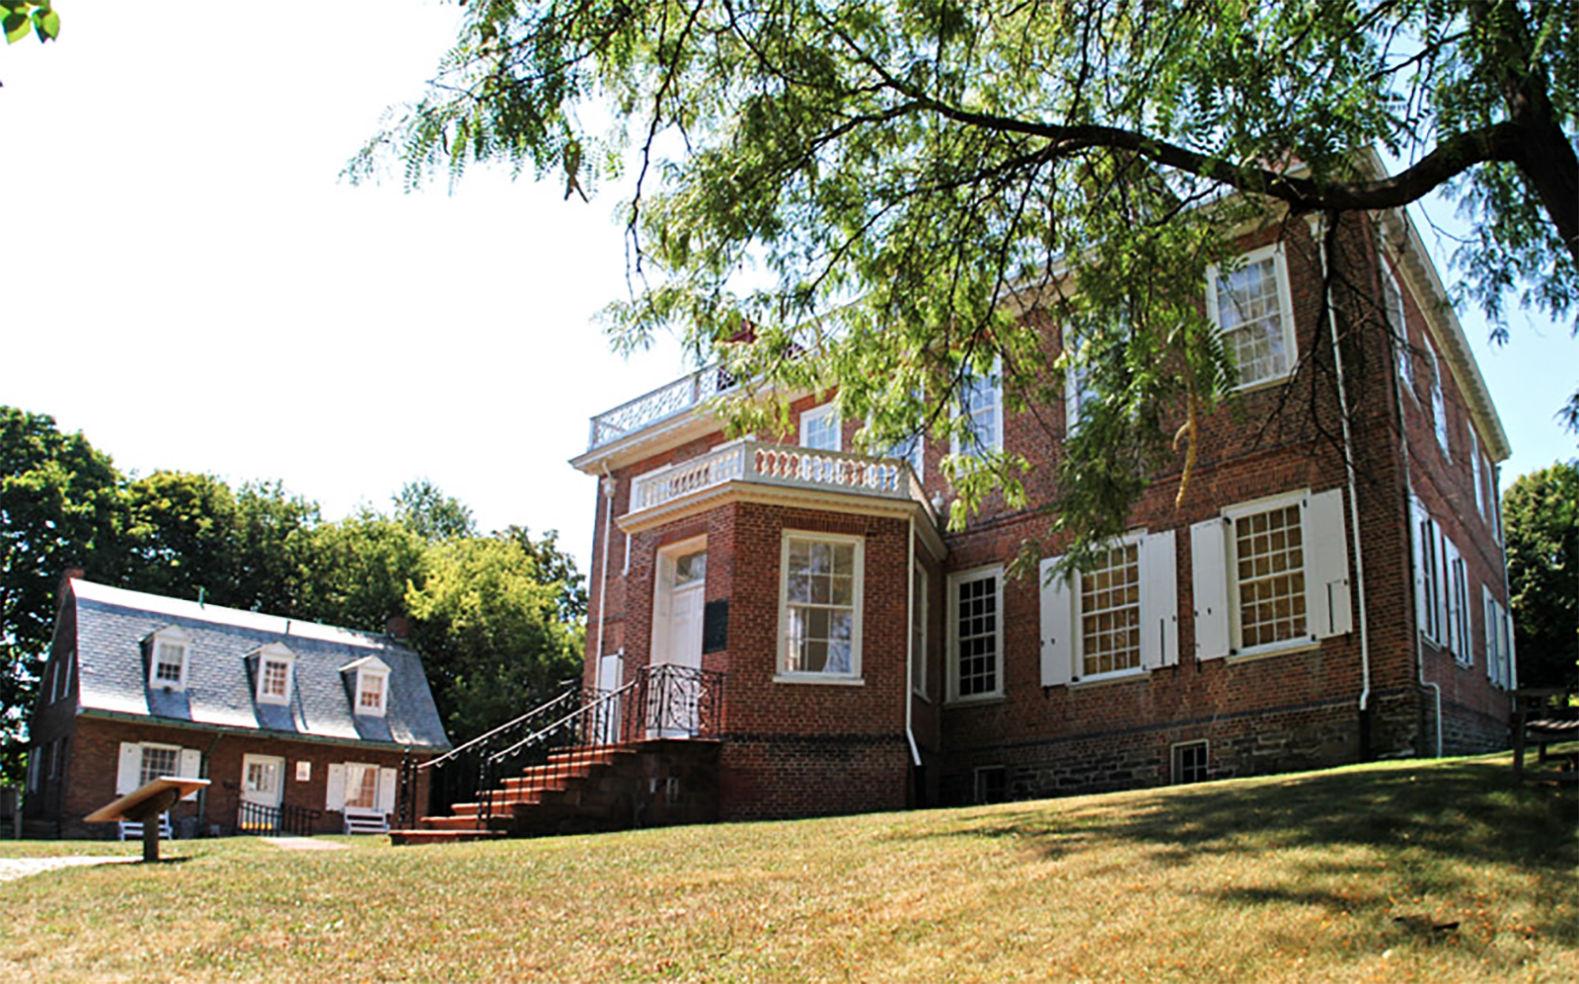 Hamilton Schuyler Mansion